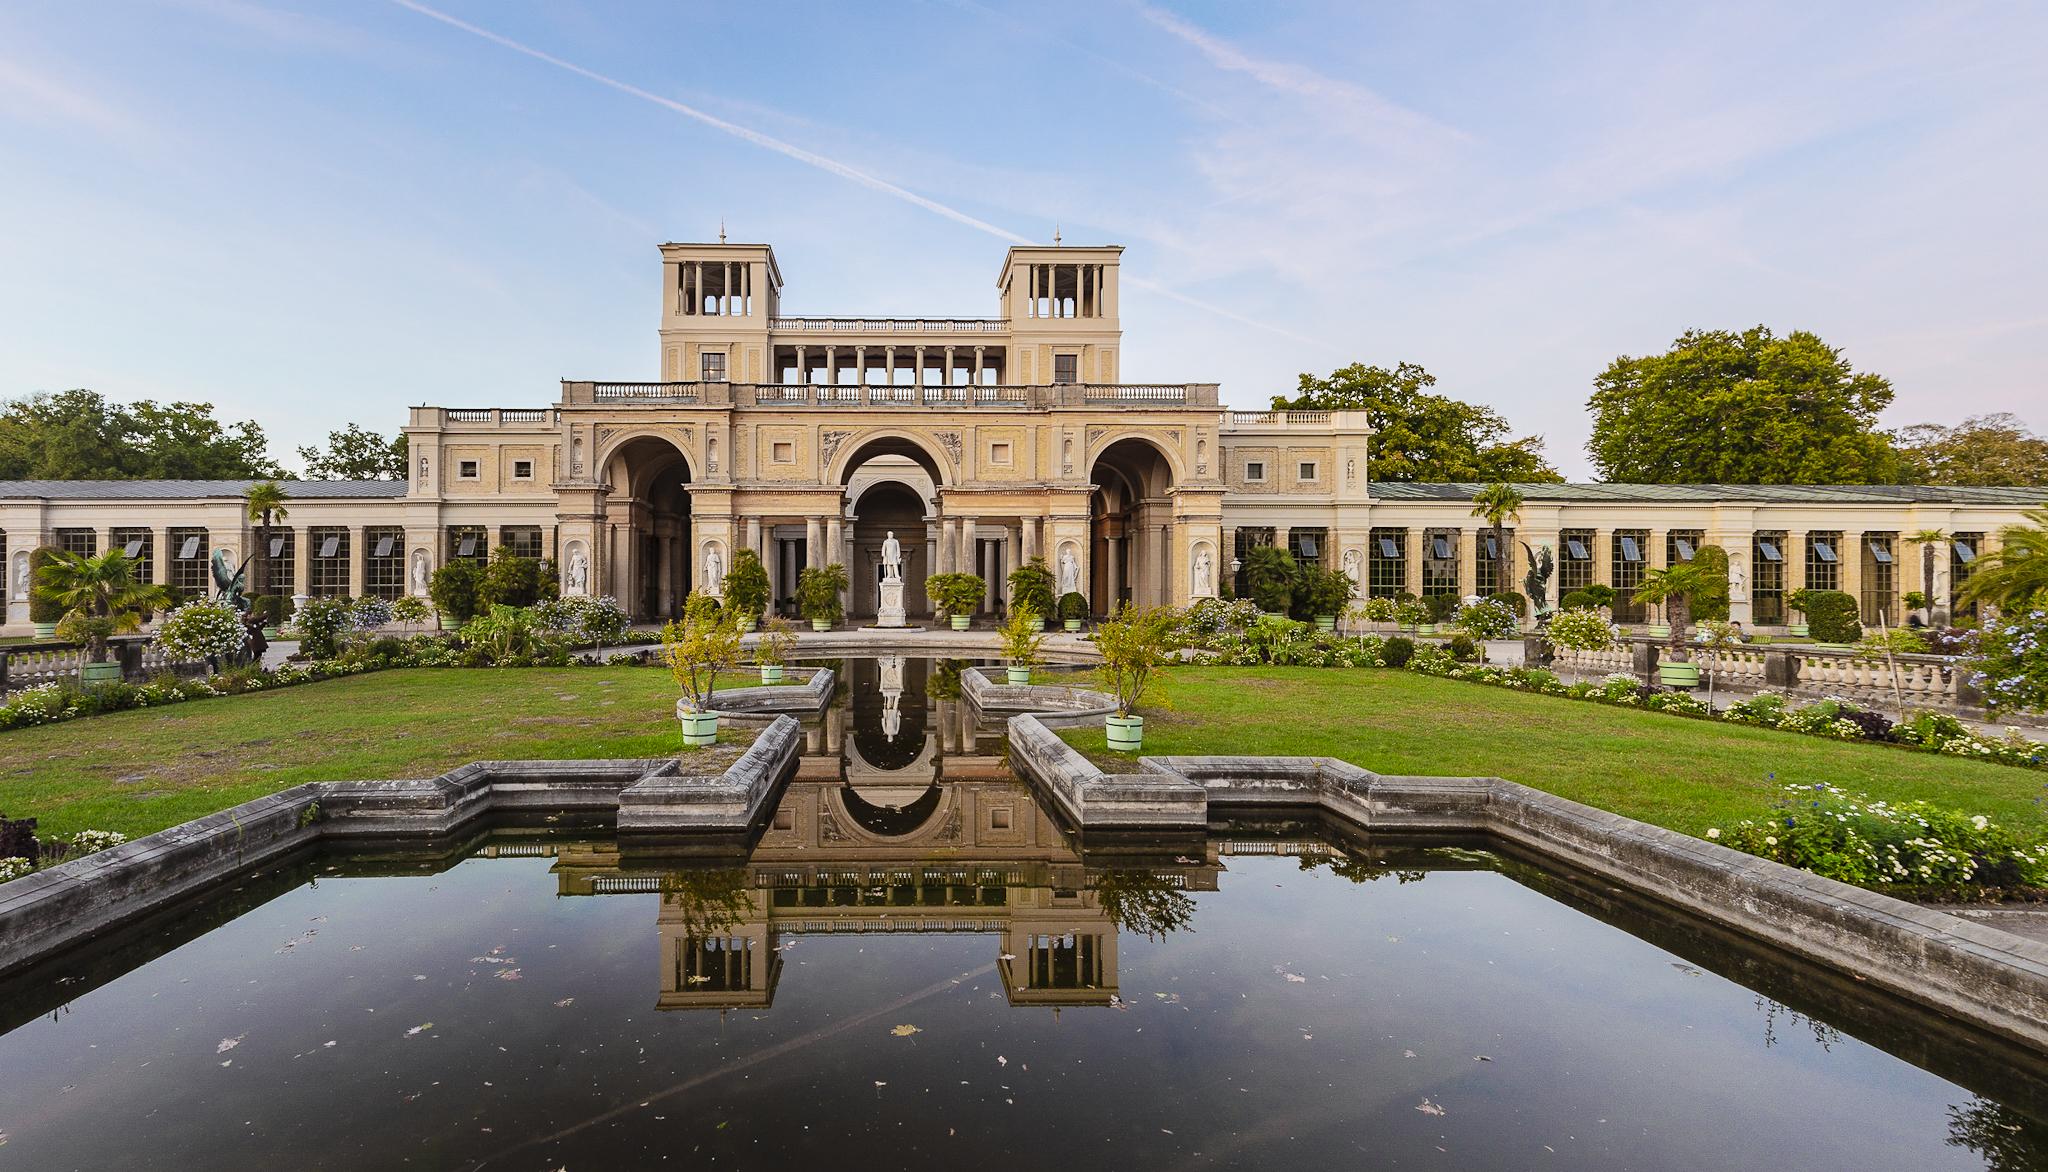 Orangerie Potsdam, Germany